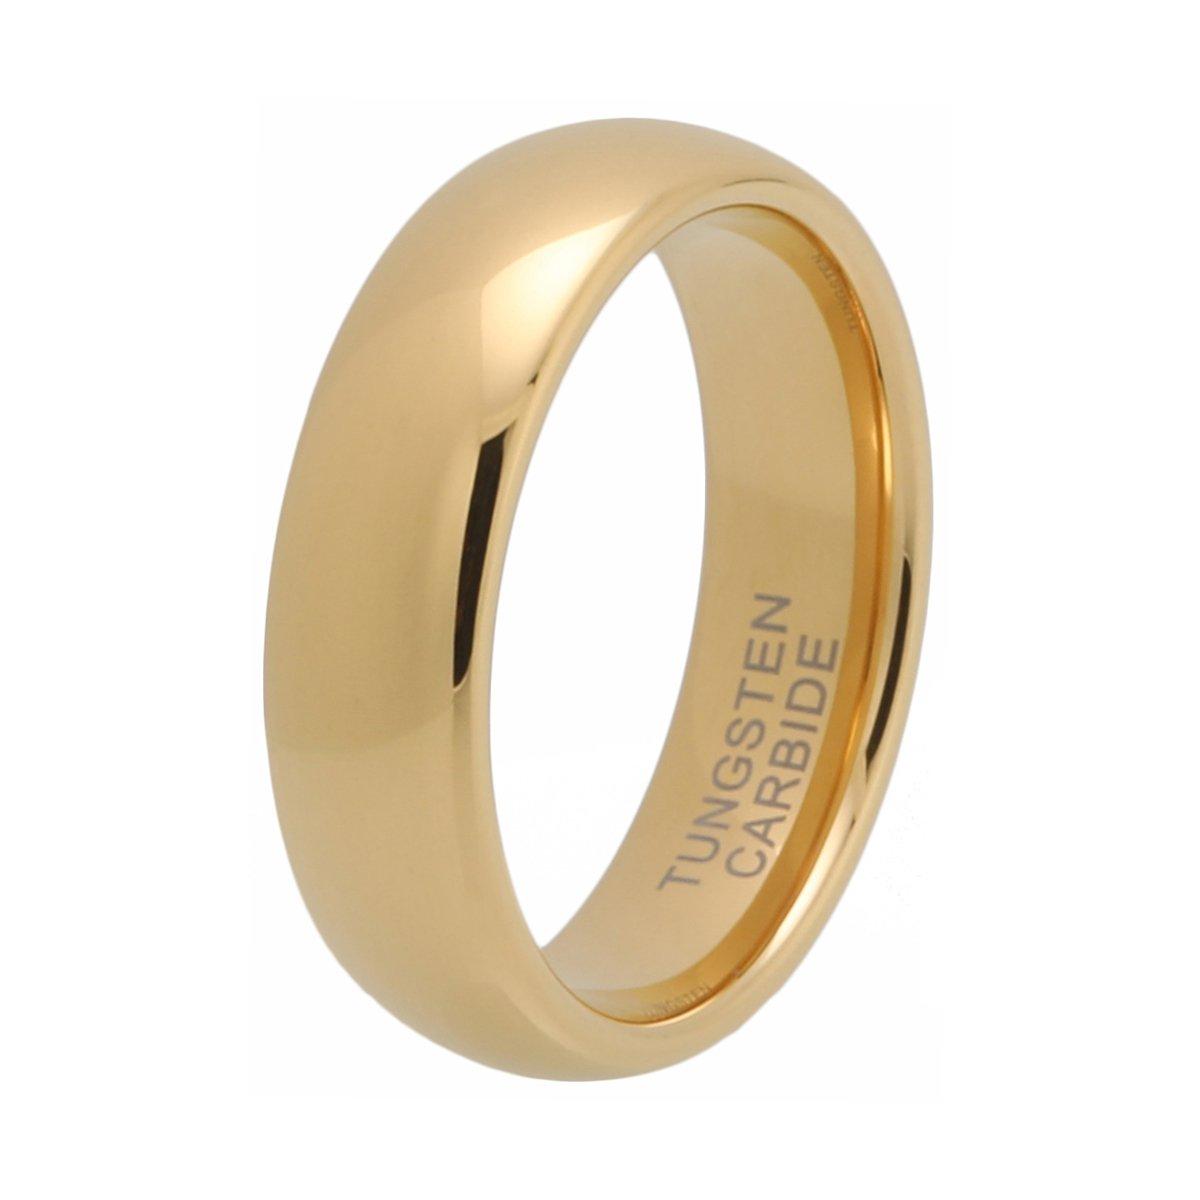 iTungsten 6mm 8mm Gold Tungsten Carbide Rings for Men Women Wedding Bands Domed Comfort Fit